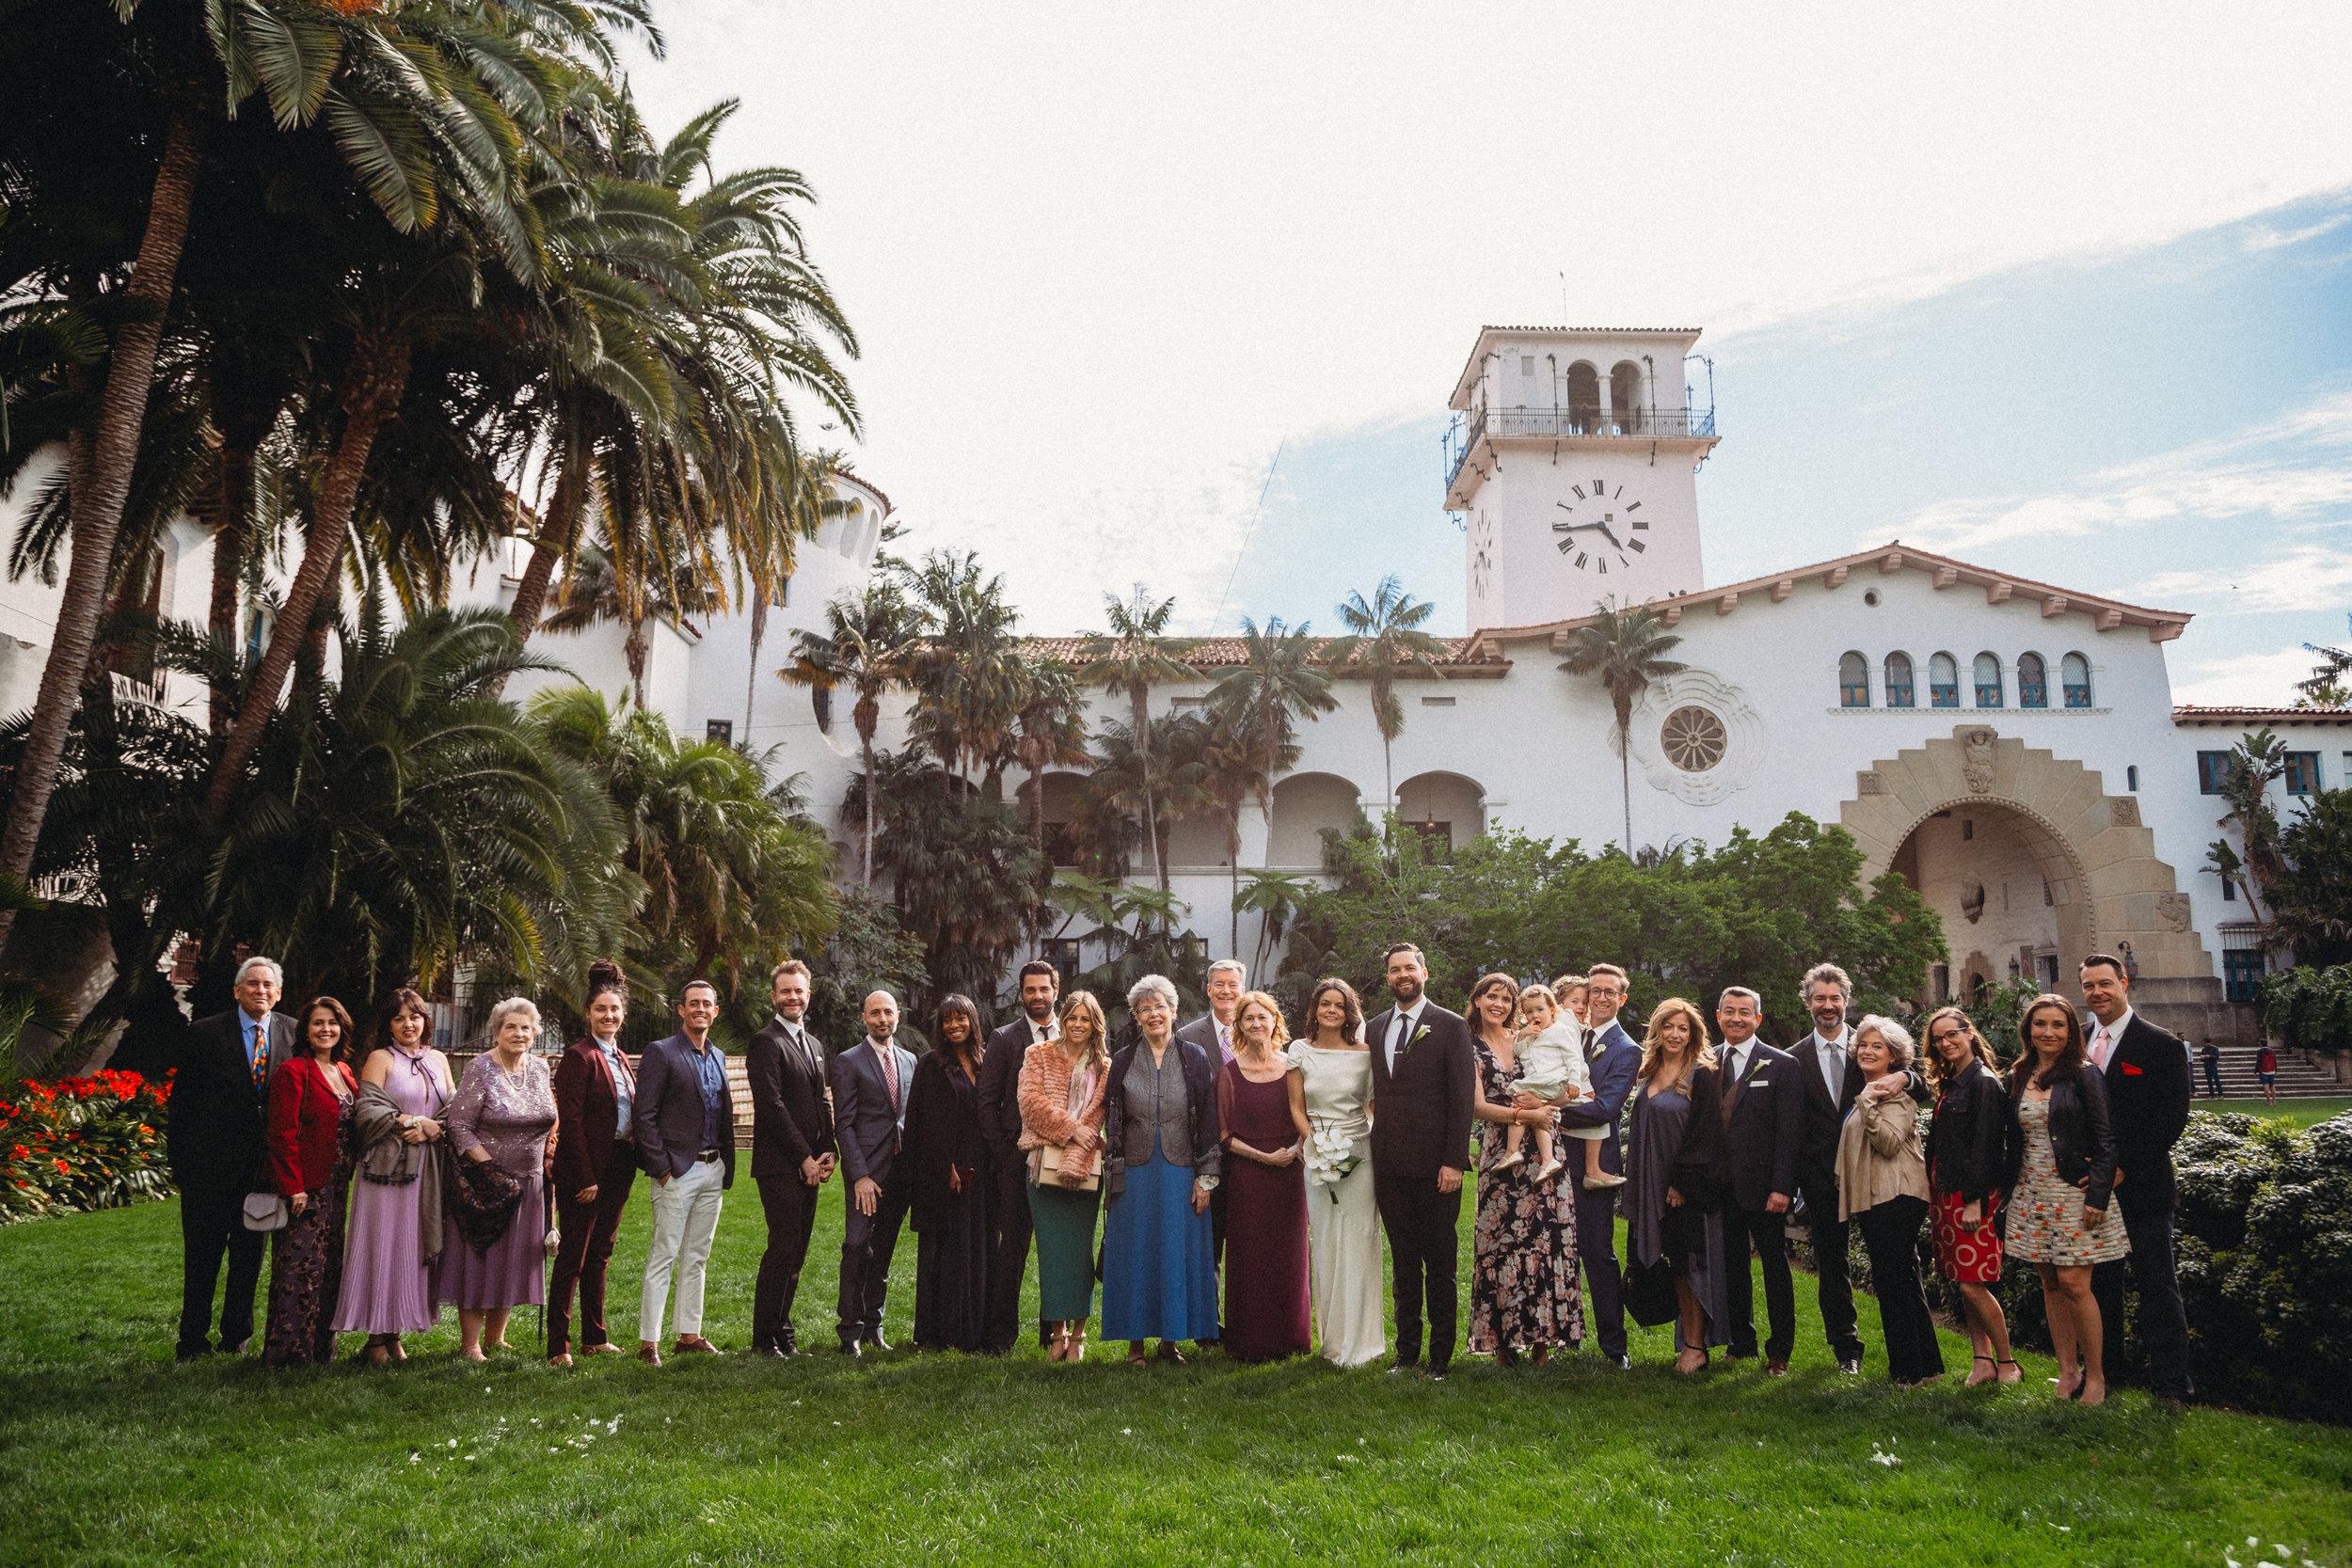 wedding-photography-santa-barbara-courthouse-rebeccaylasotras-112.jpg